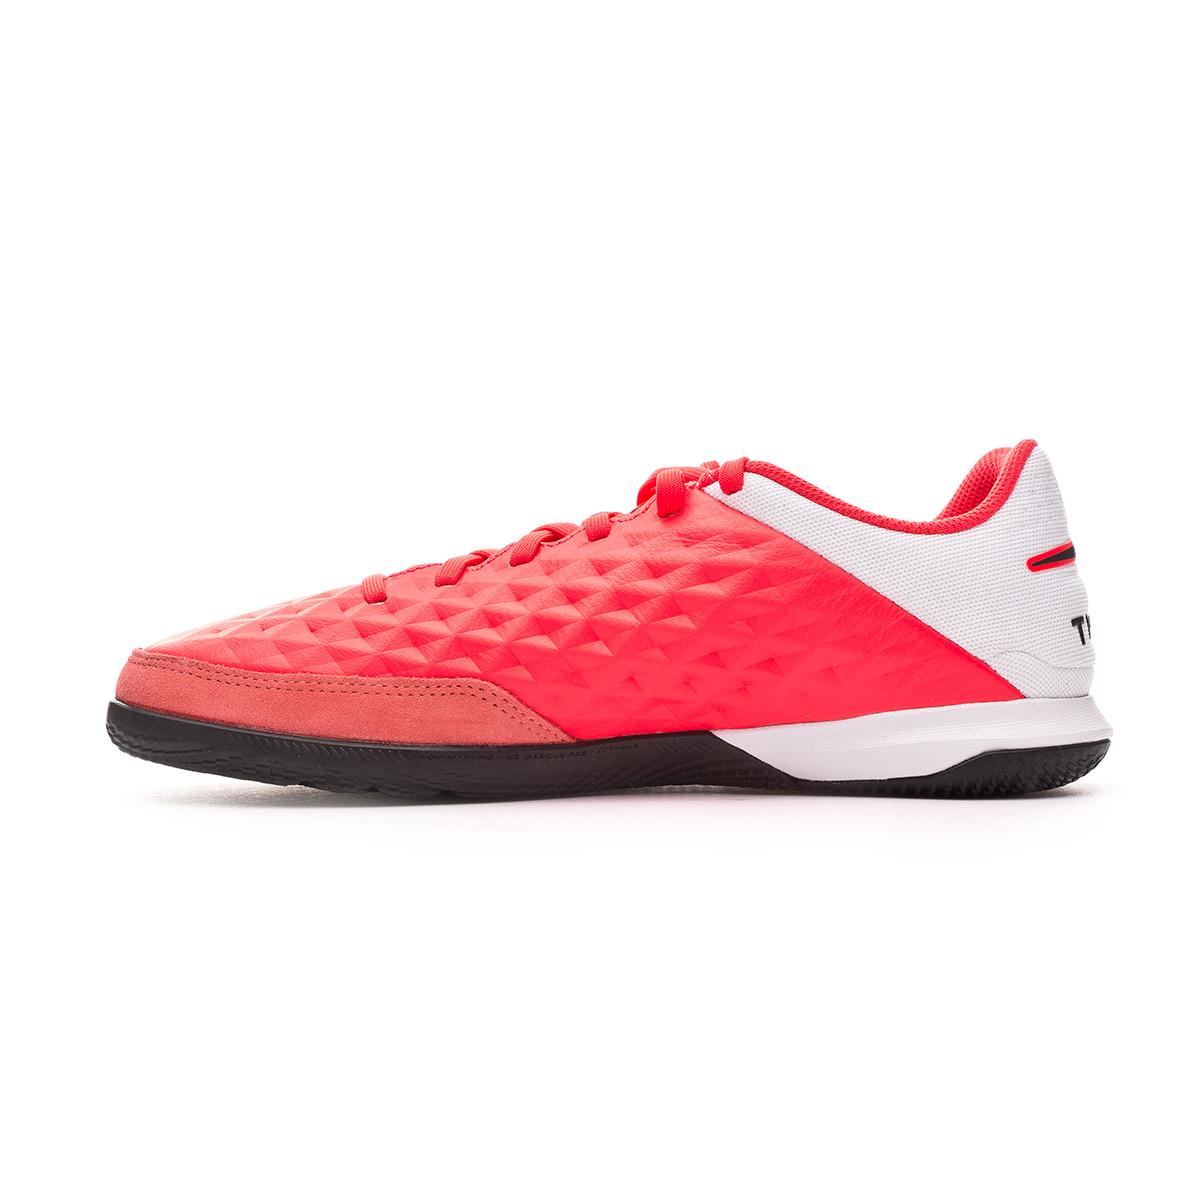 Sapatilha de Futsal Nike Tiempo Legend VIII Academy IC